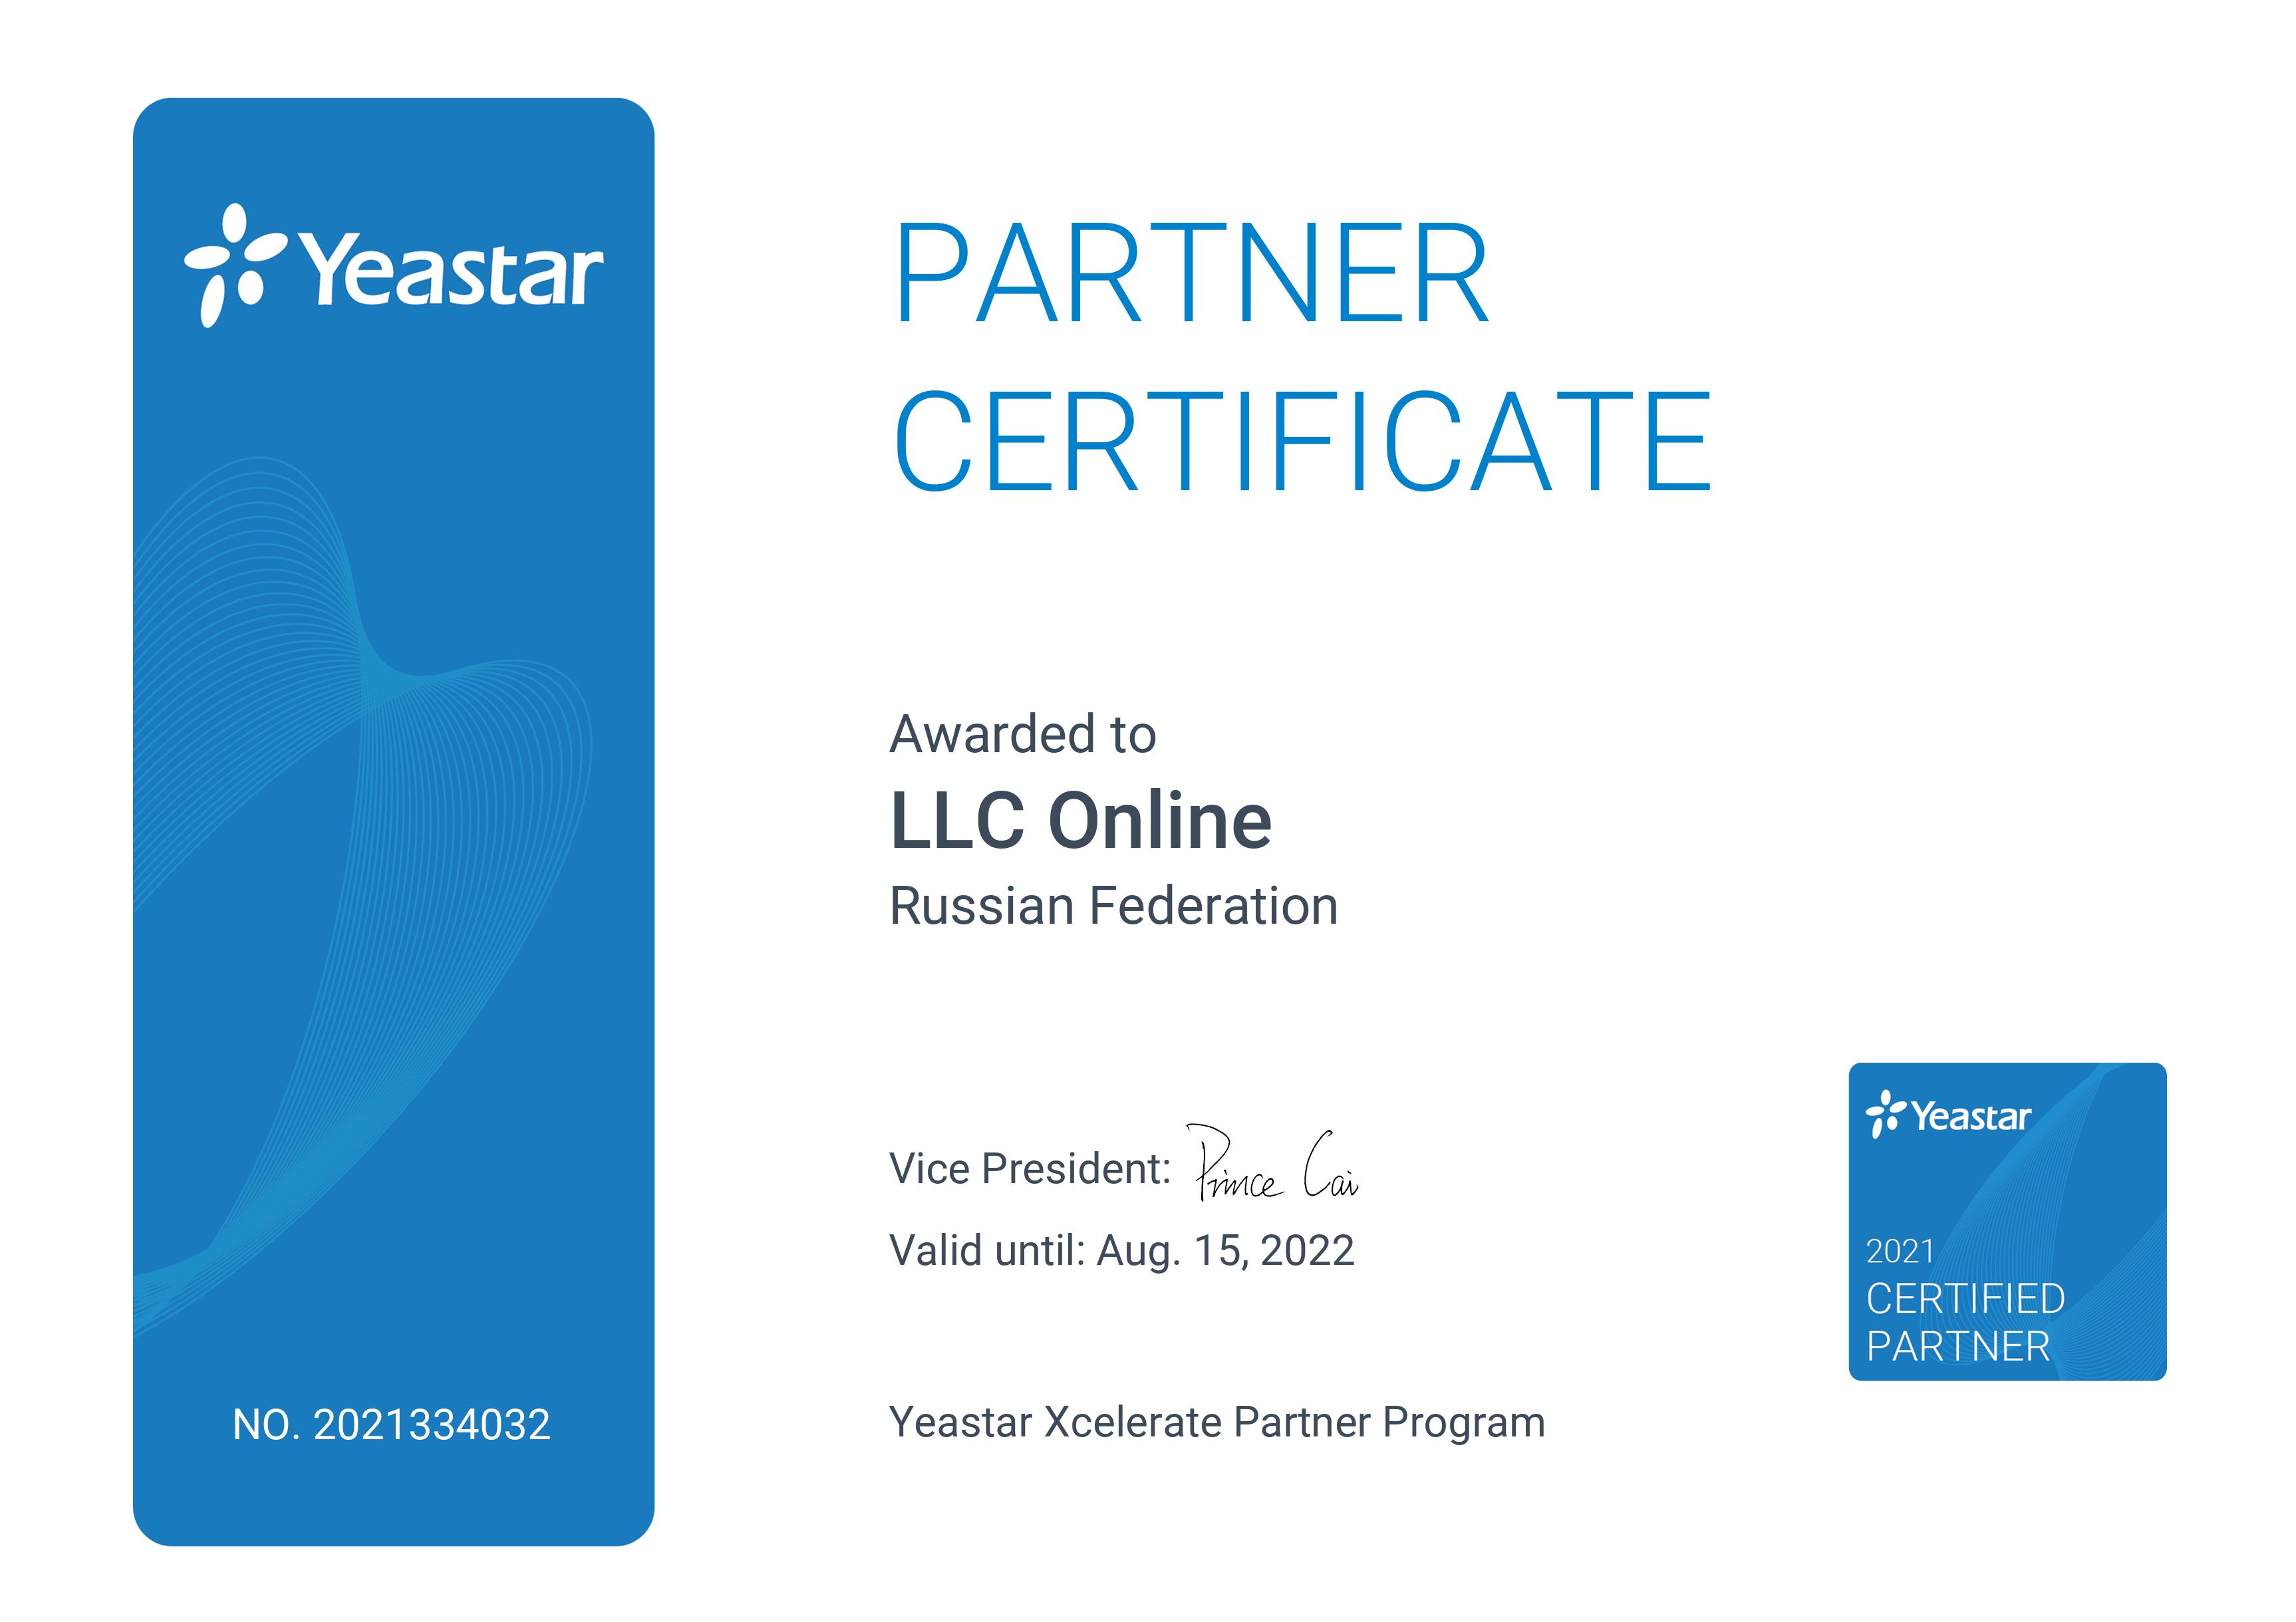 Yeastar PARTNER 2021-2022